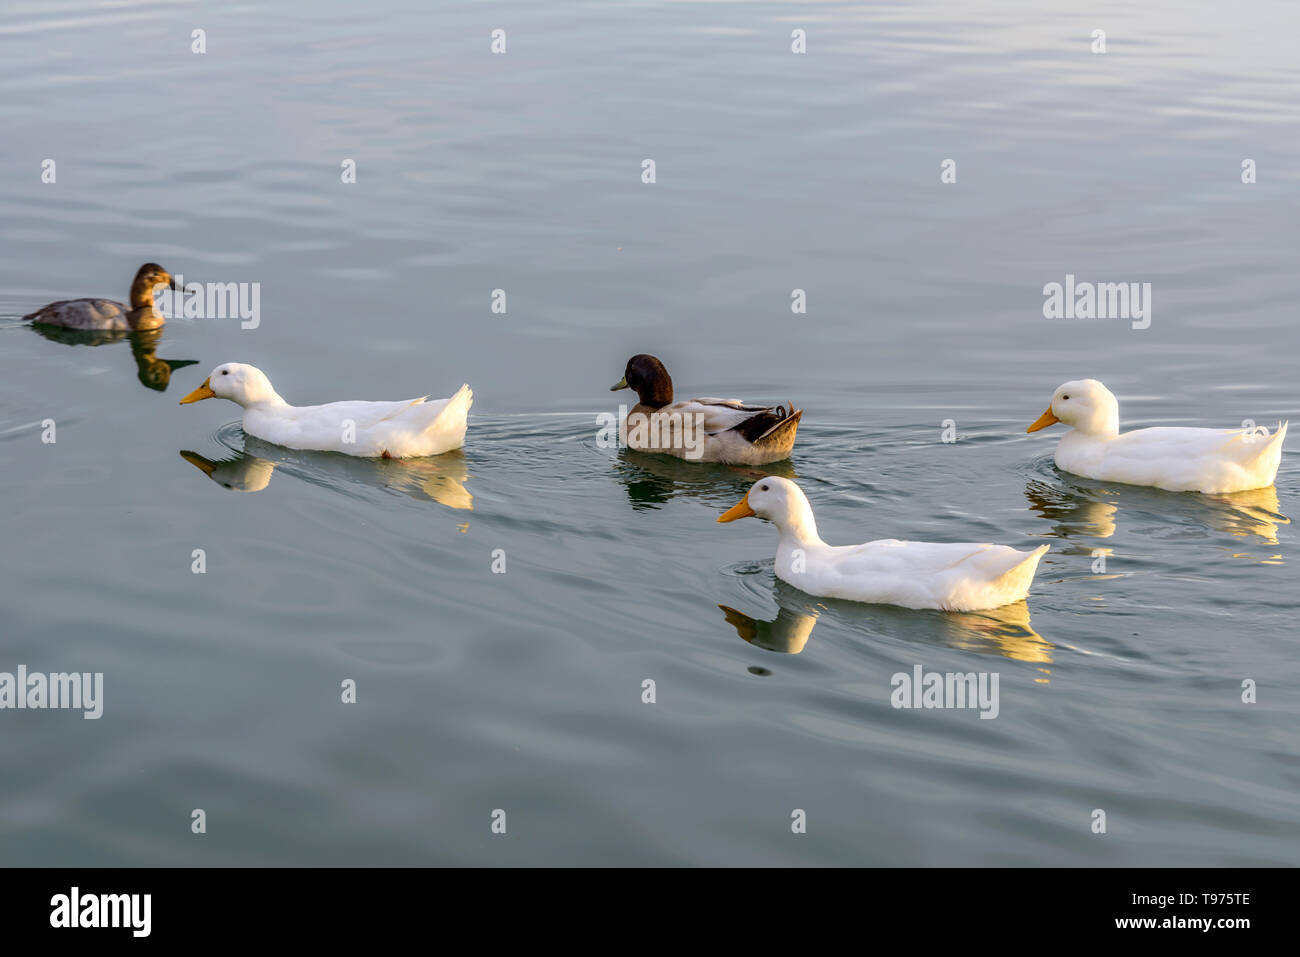 White Ducks - A group of white American Pekin ducks swimming on a lake in an evening of January. Veterans Oasis Lake, Chandler, Arizona, USA. - Stock Image